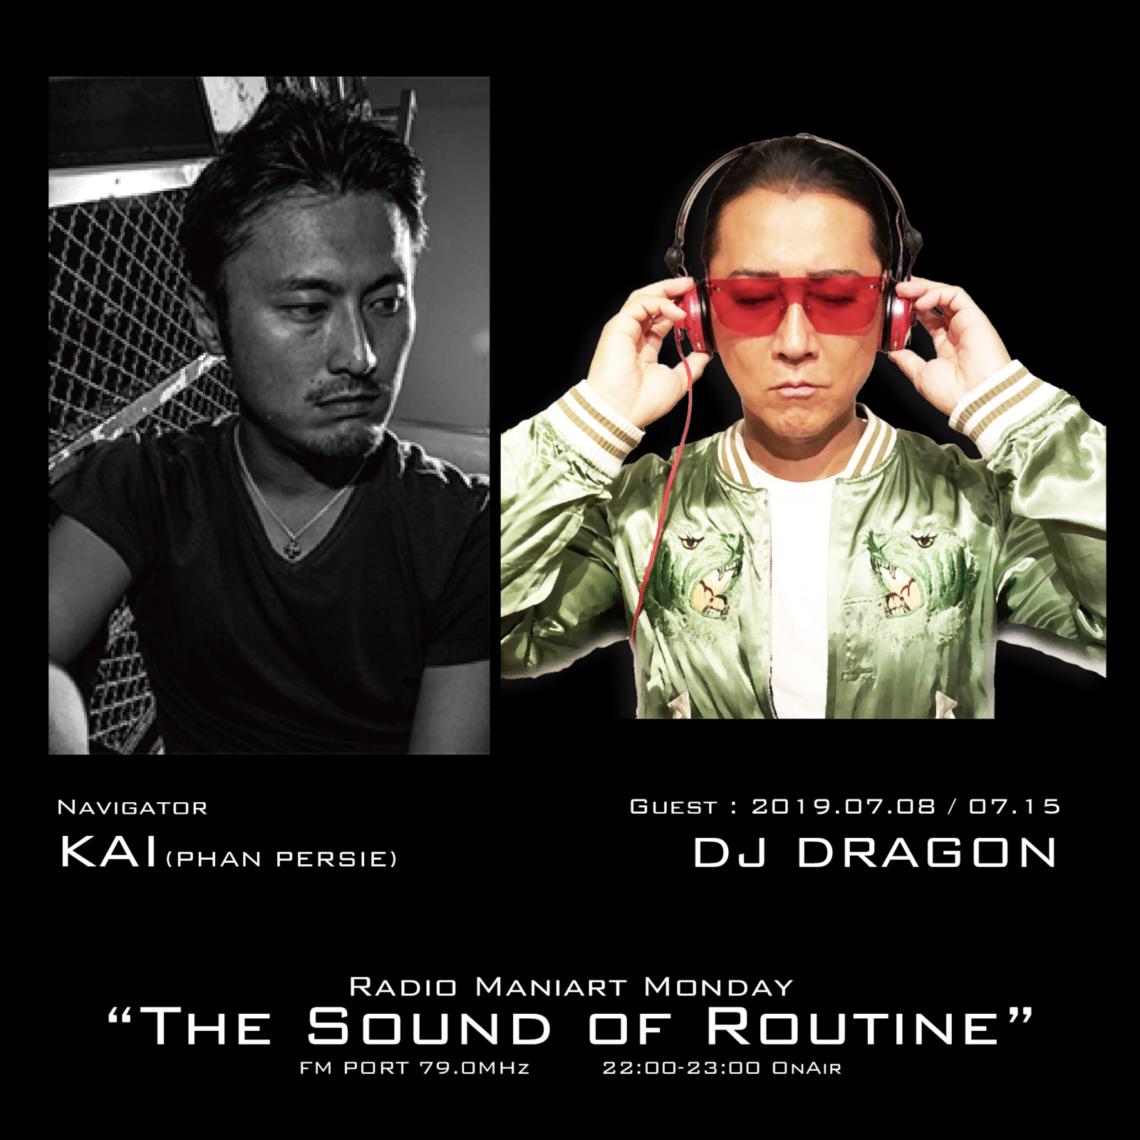 2019. 7. 8 MON, 7. 15 MON – KAI : Navigator on FM PORT / the Sound of Routine – Guest :DJ DRAGON